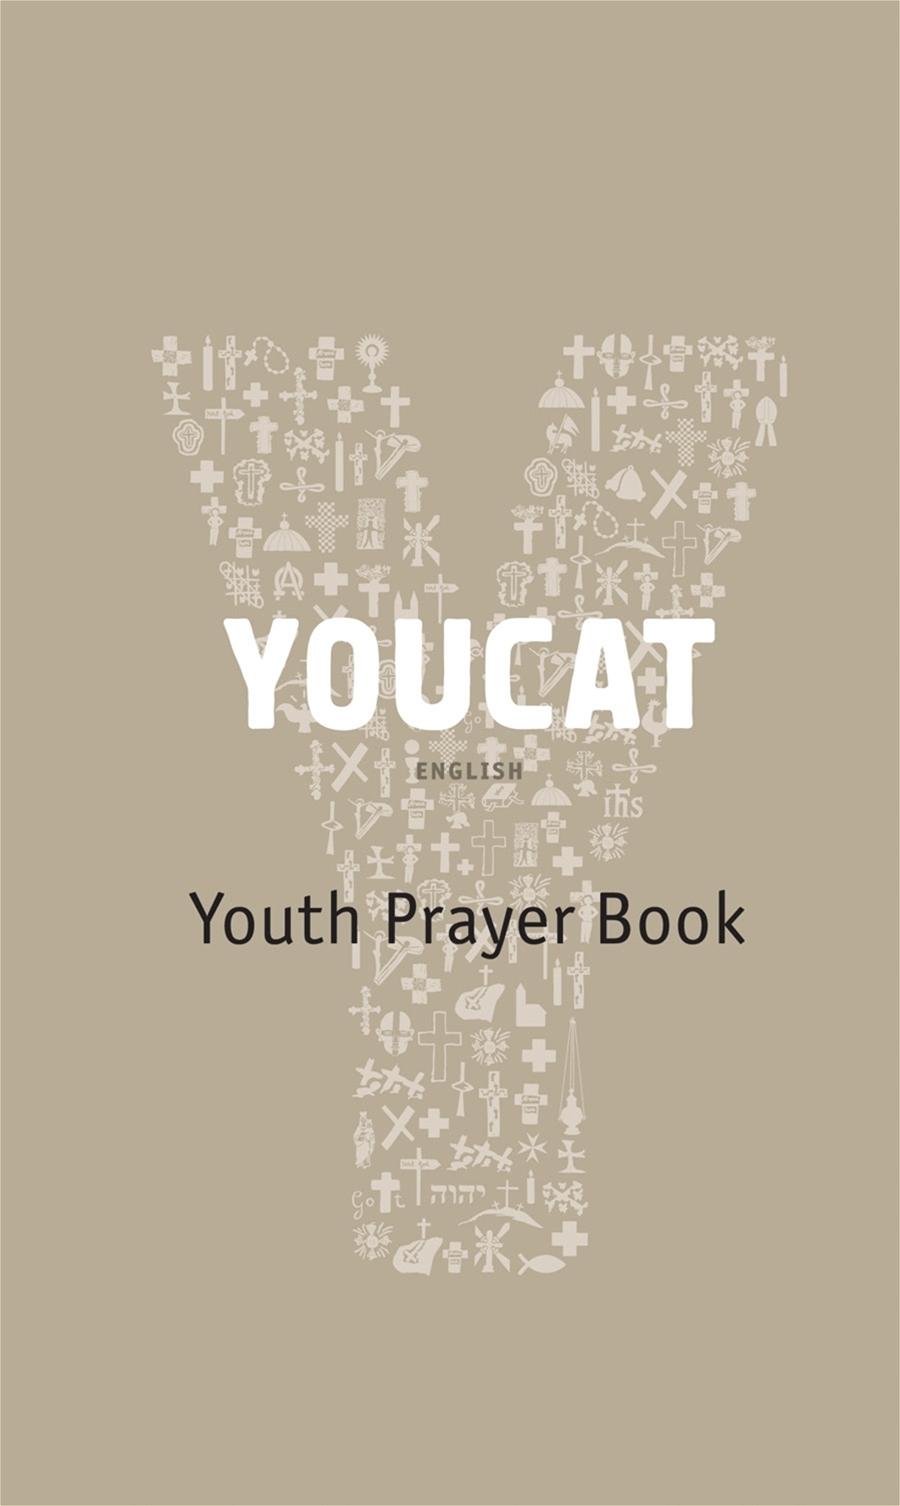 YOUCAT Youth Prayer Book